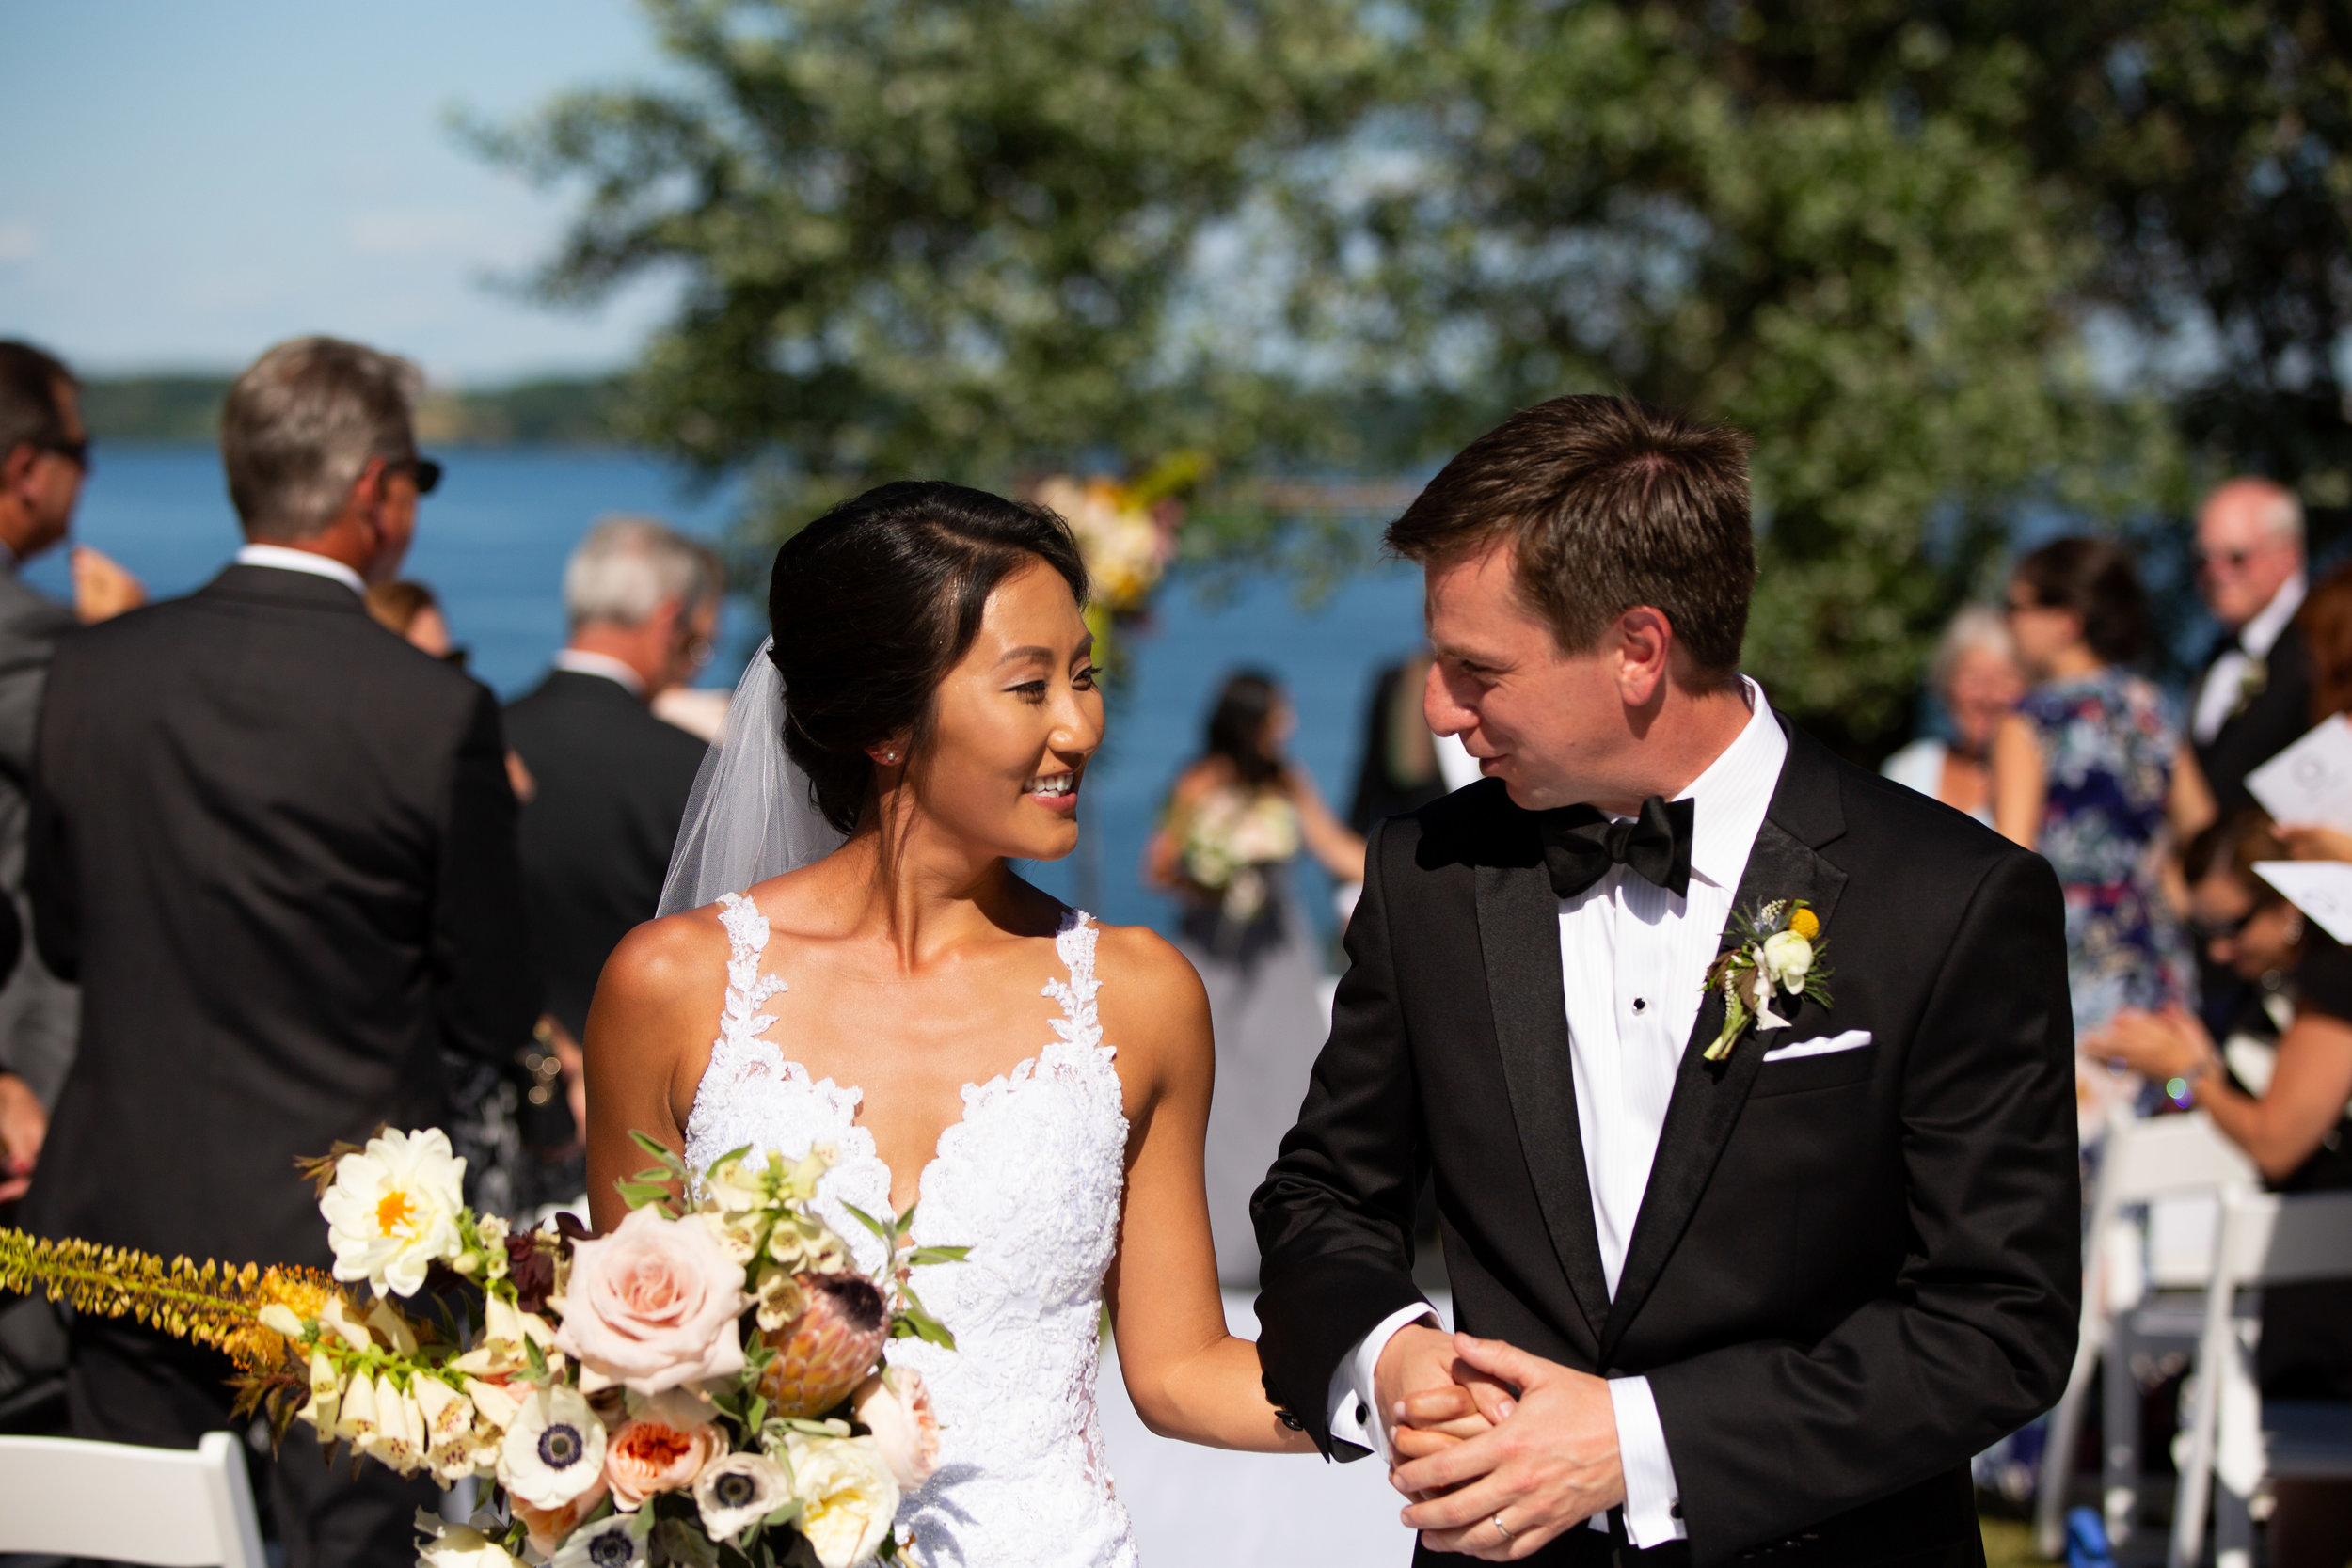 EmilyandBrian_Wedding_CiaoBellaStudios_GenevaontheLake-8.jpg